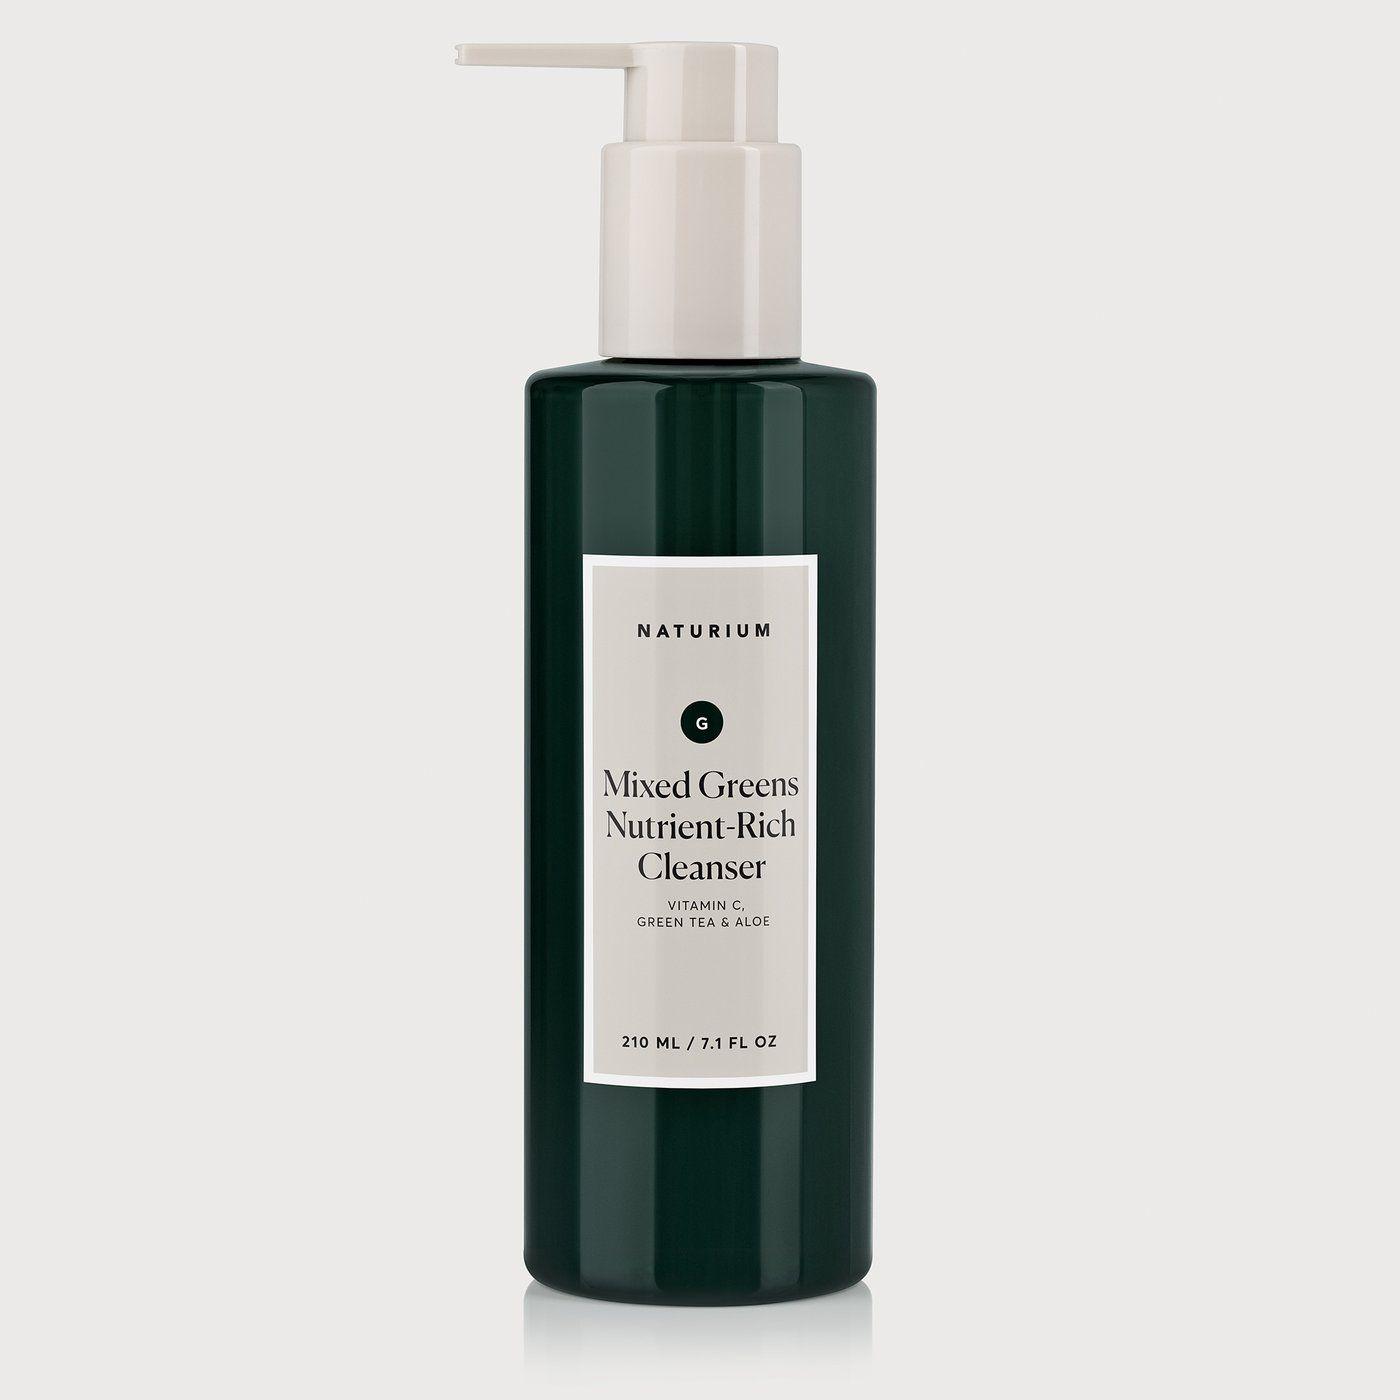 Naturium Mixed Greens Nutrient-Rich Cleanser